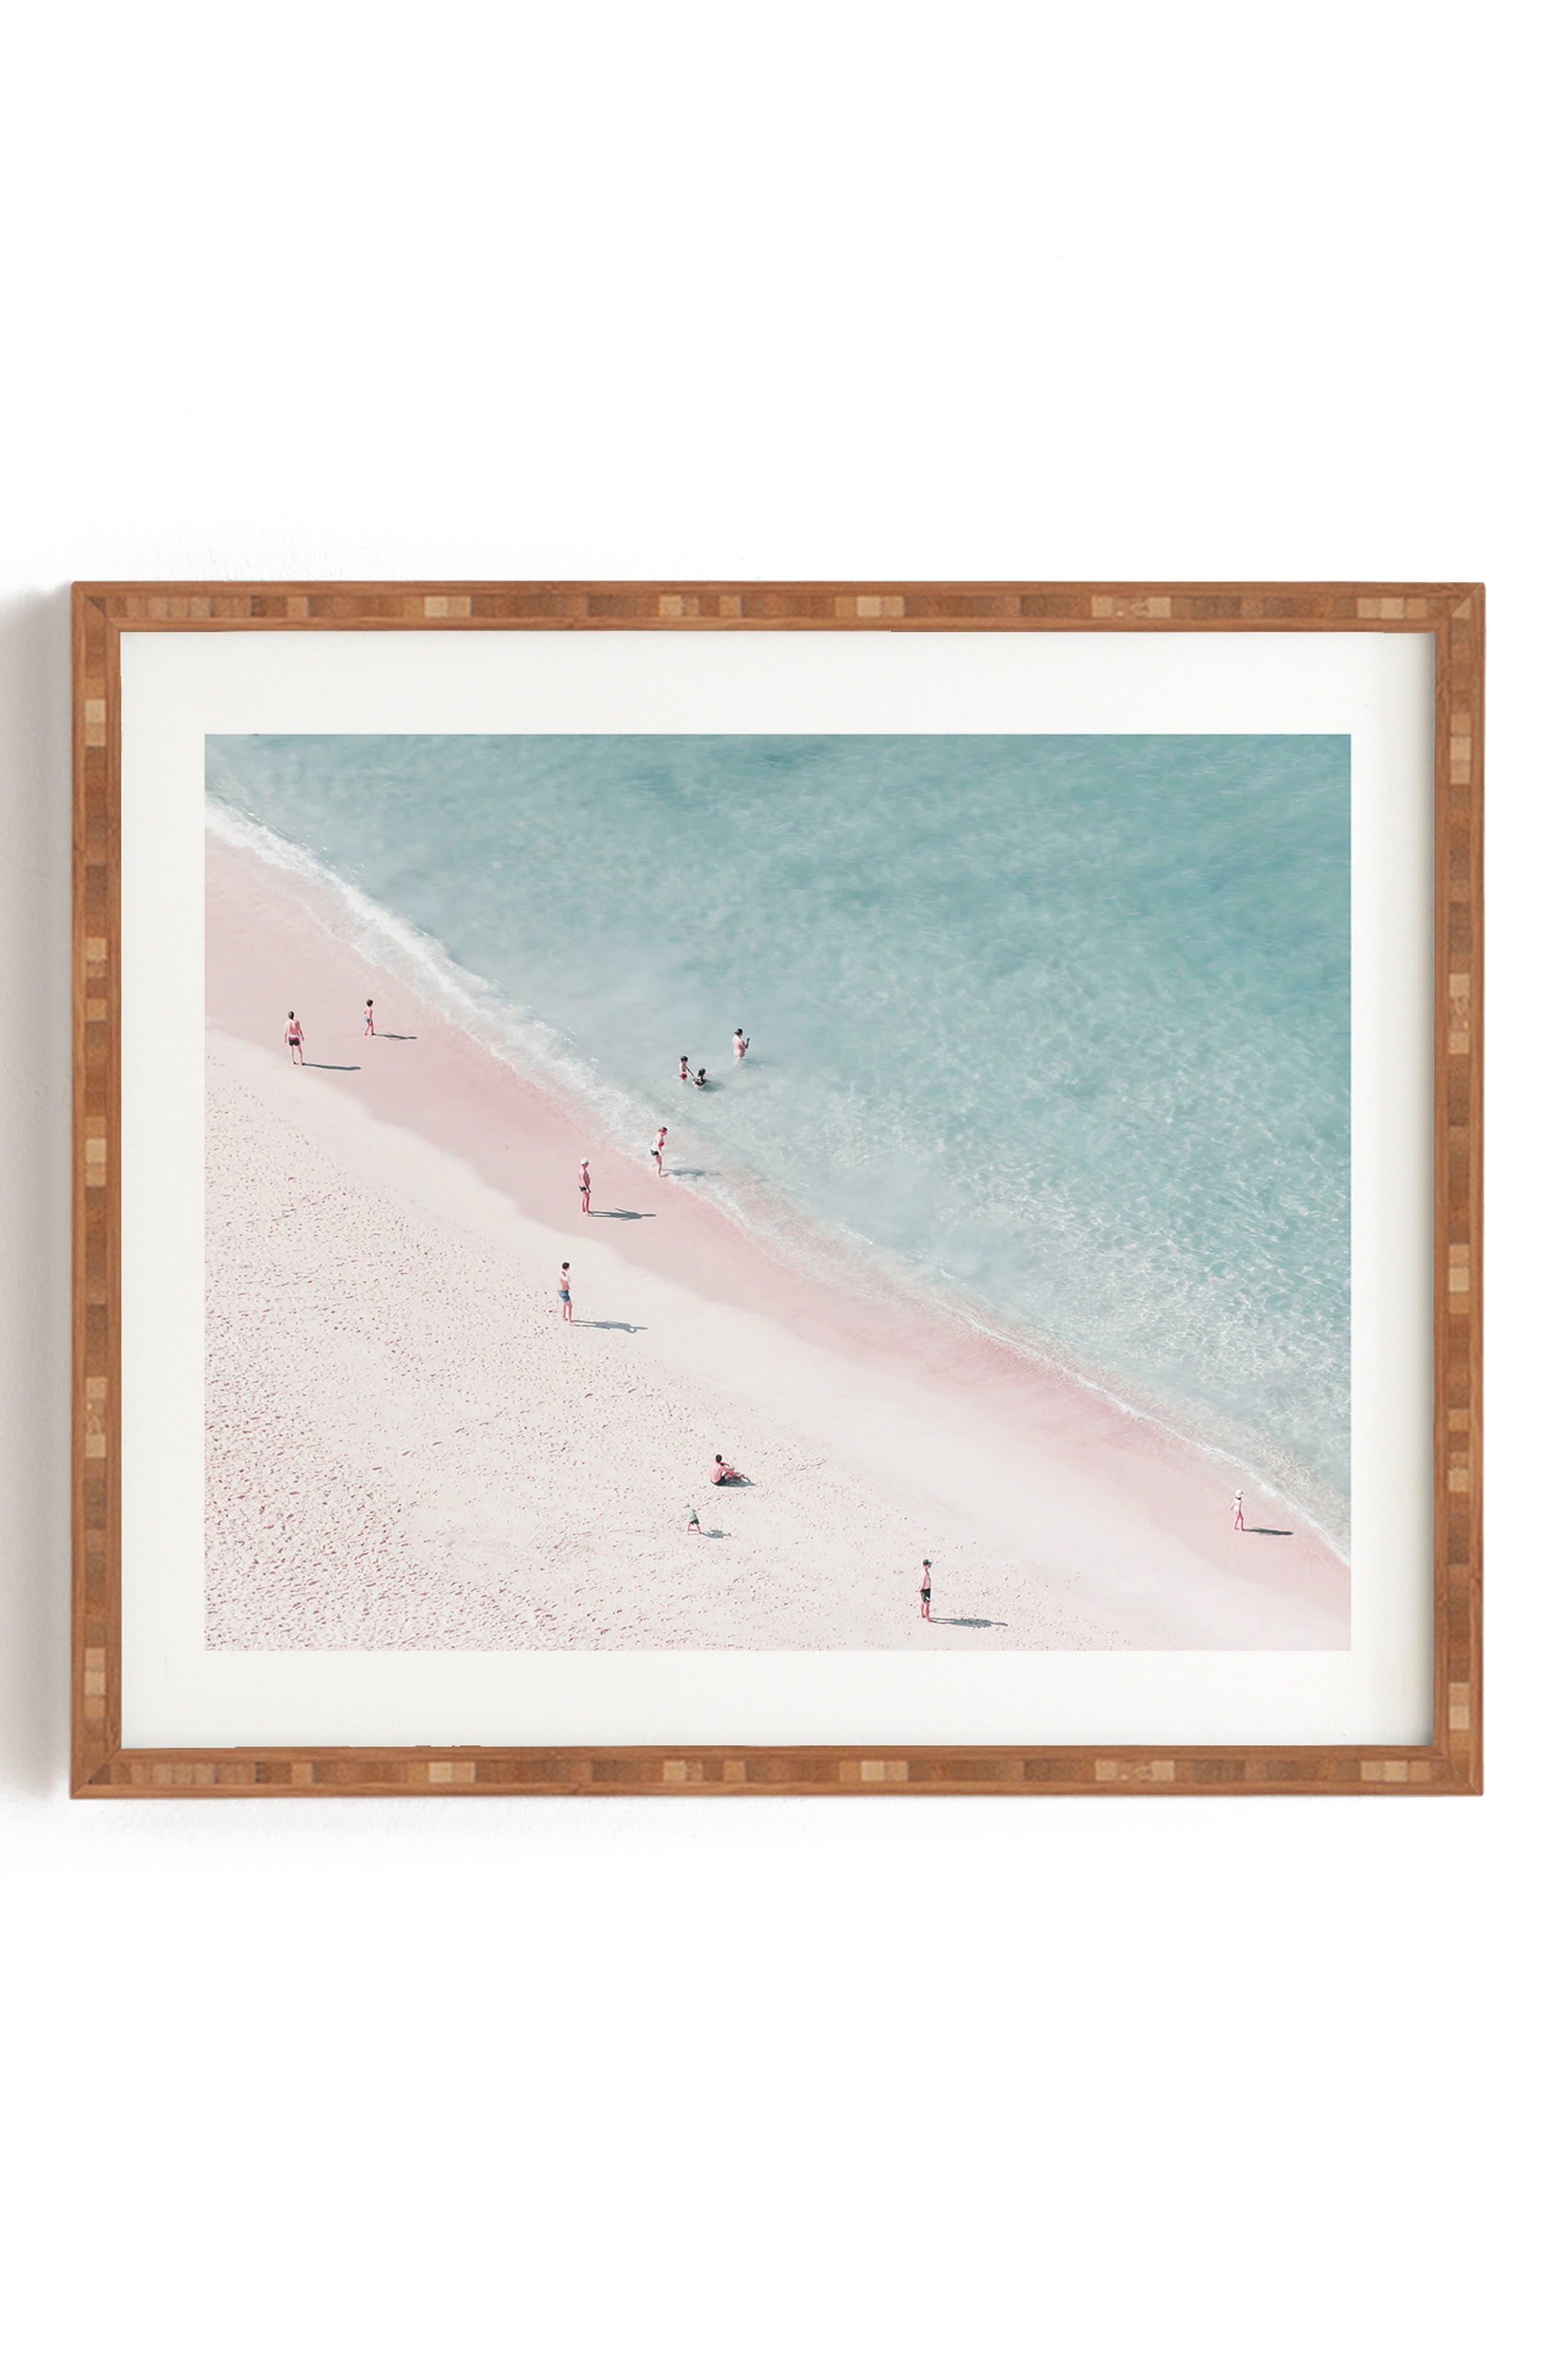 DENY DESIGNS Ingrid Beddoes - Beach Summer of Love Framed Wall Art, Main, color, PINK